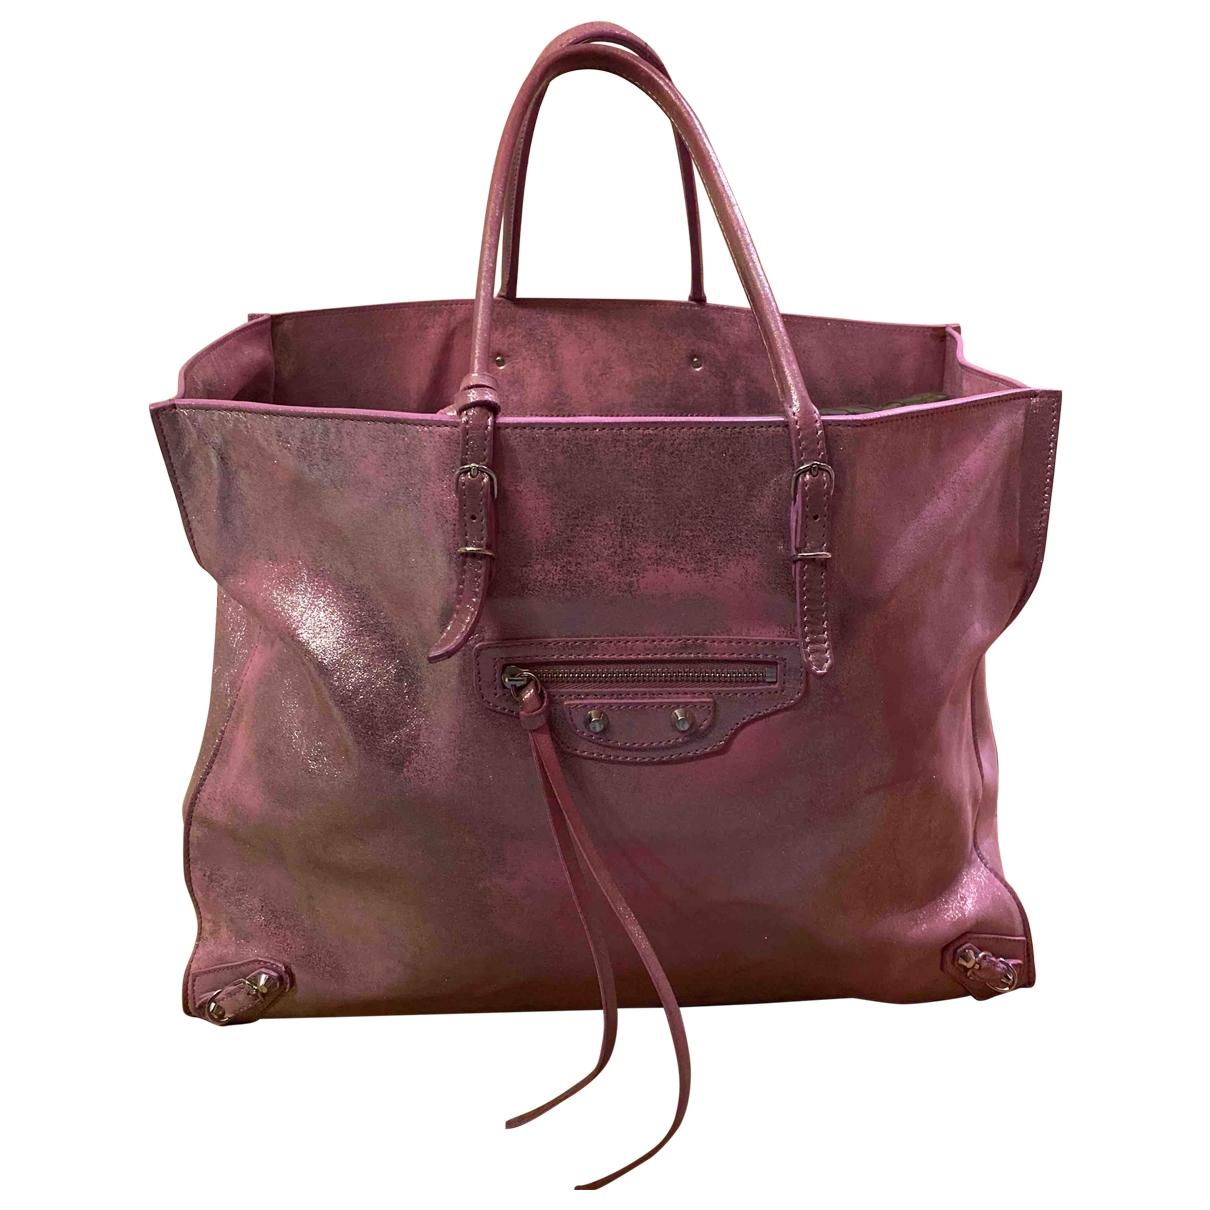 Balenciaga Papier Pink Leather handbag for Women \N